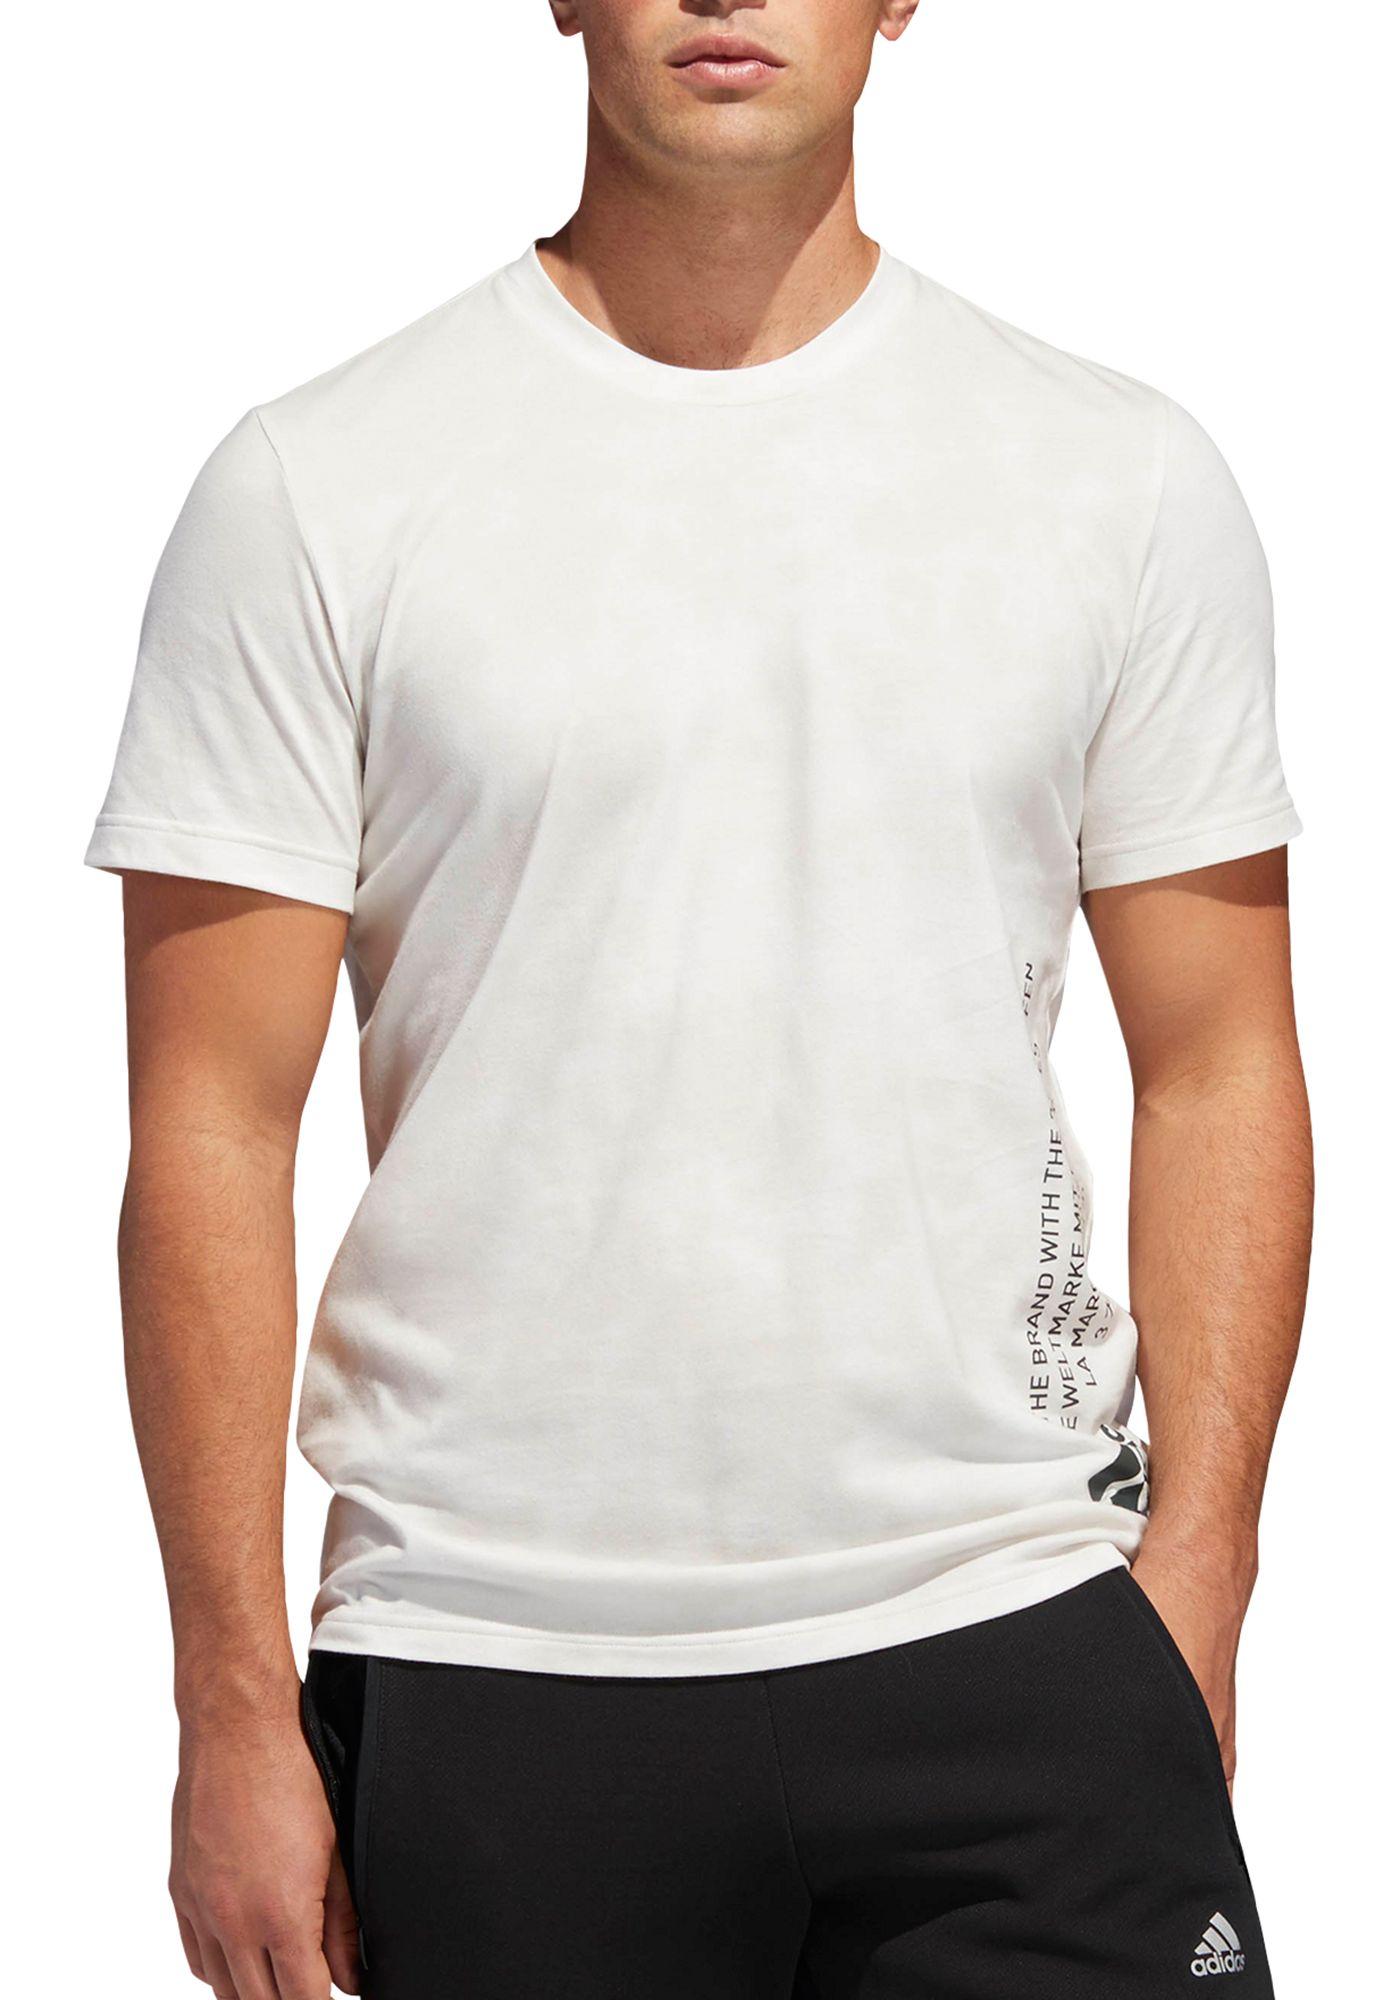 adidas Men's Badge Of Sport Wash Vertical Graphic T-Shirt